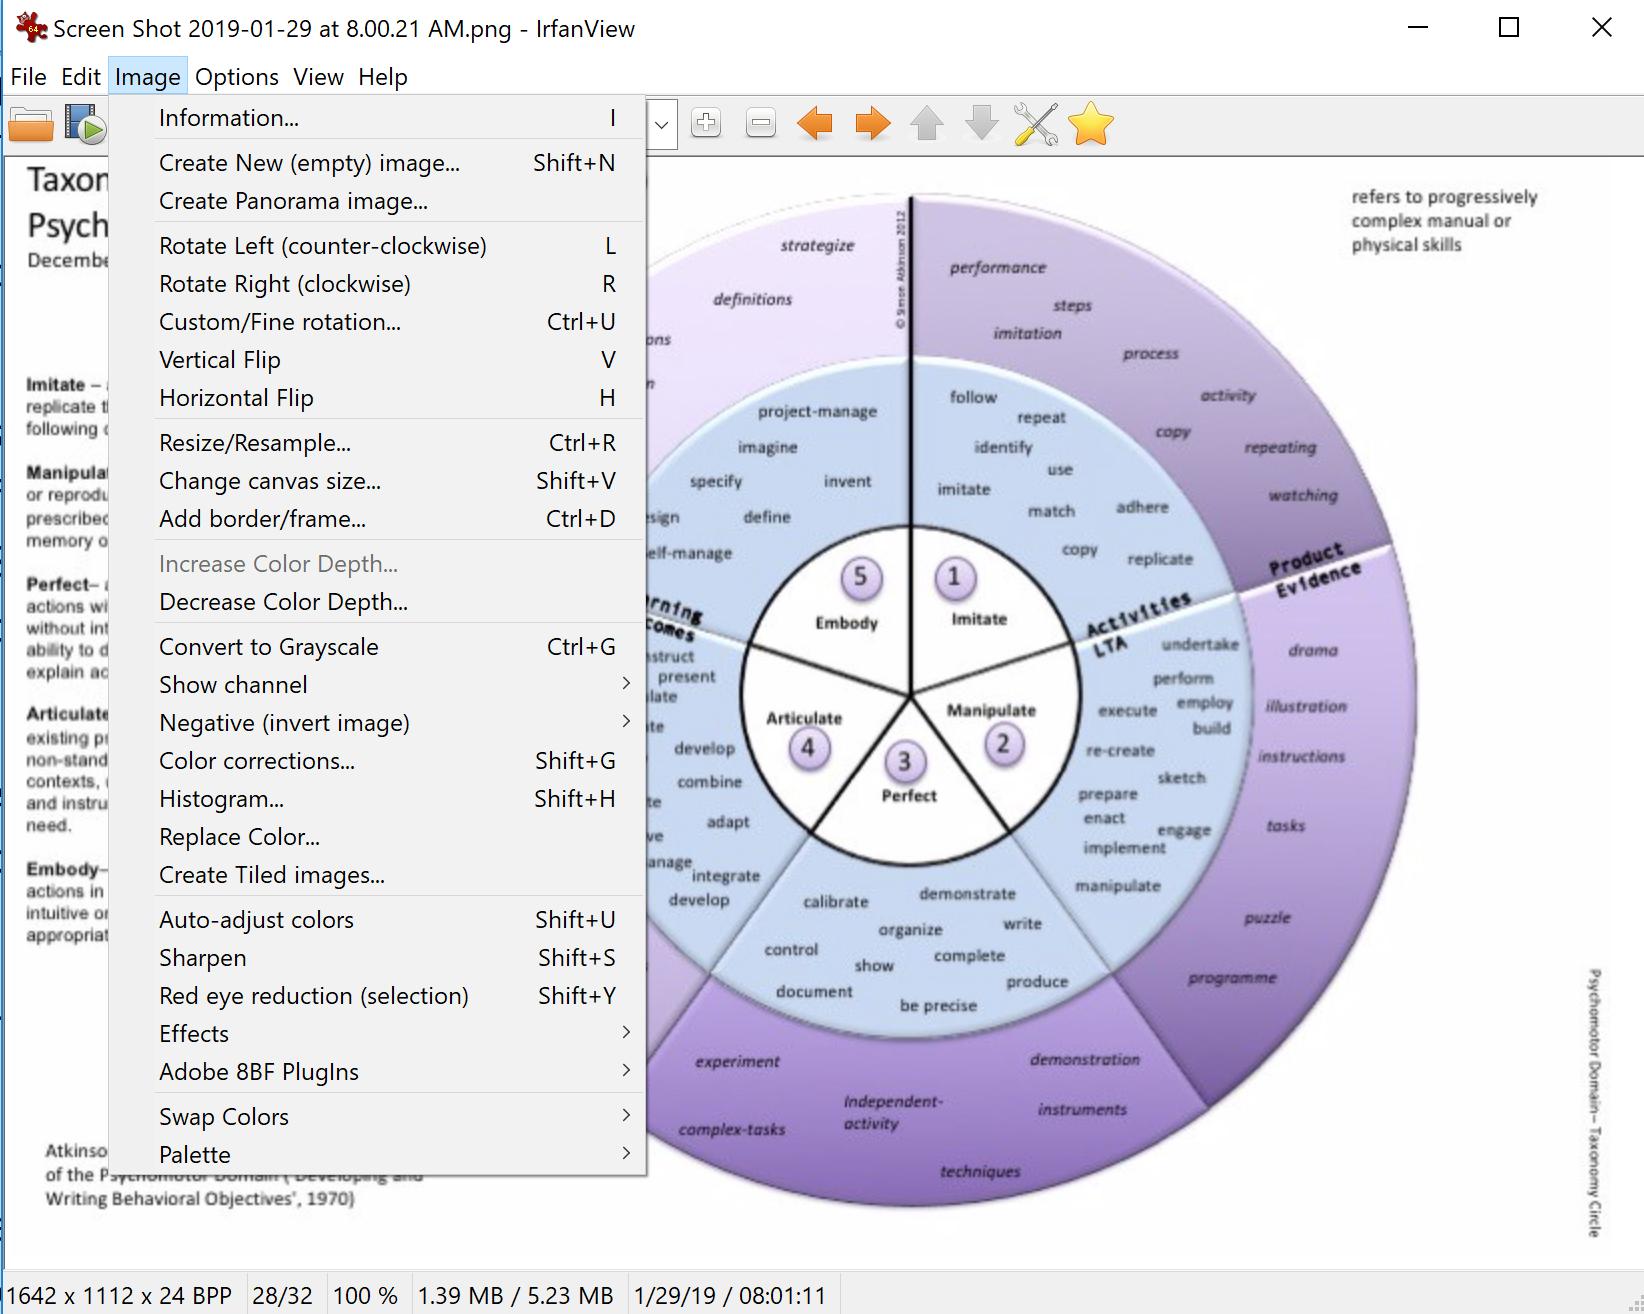 Screen shot using InfraView